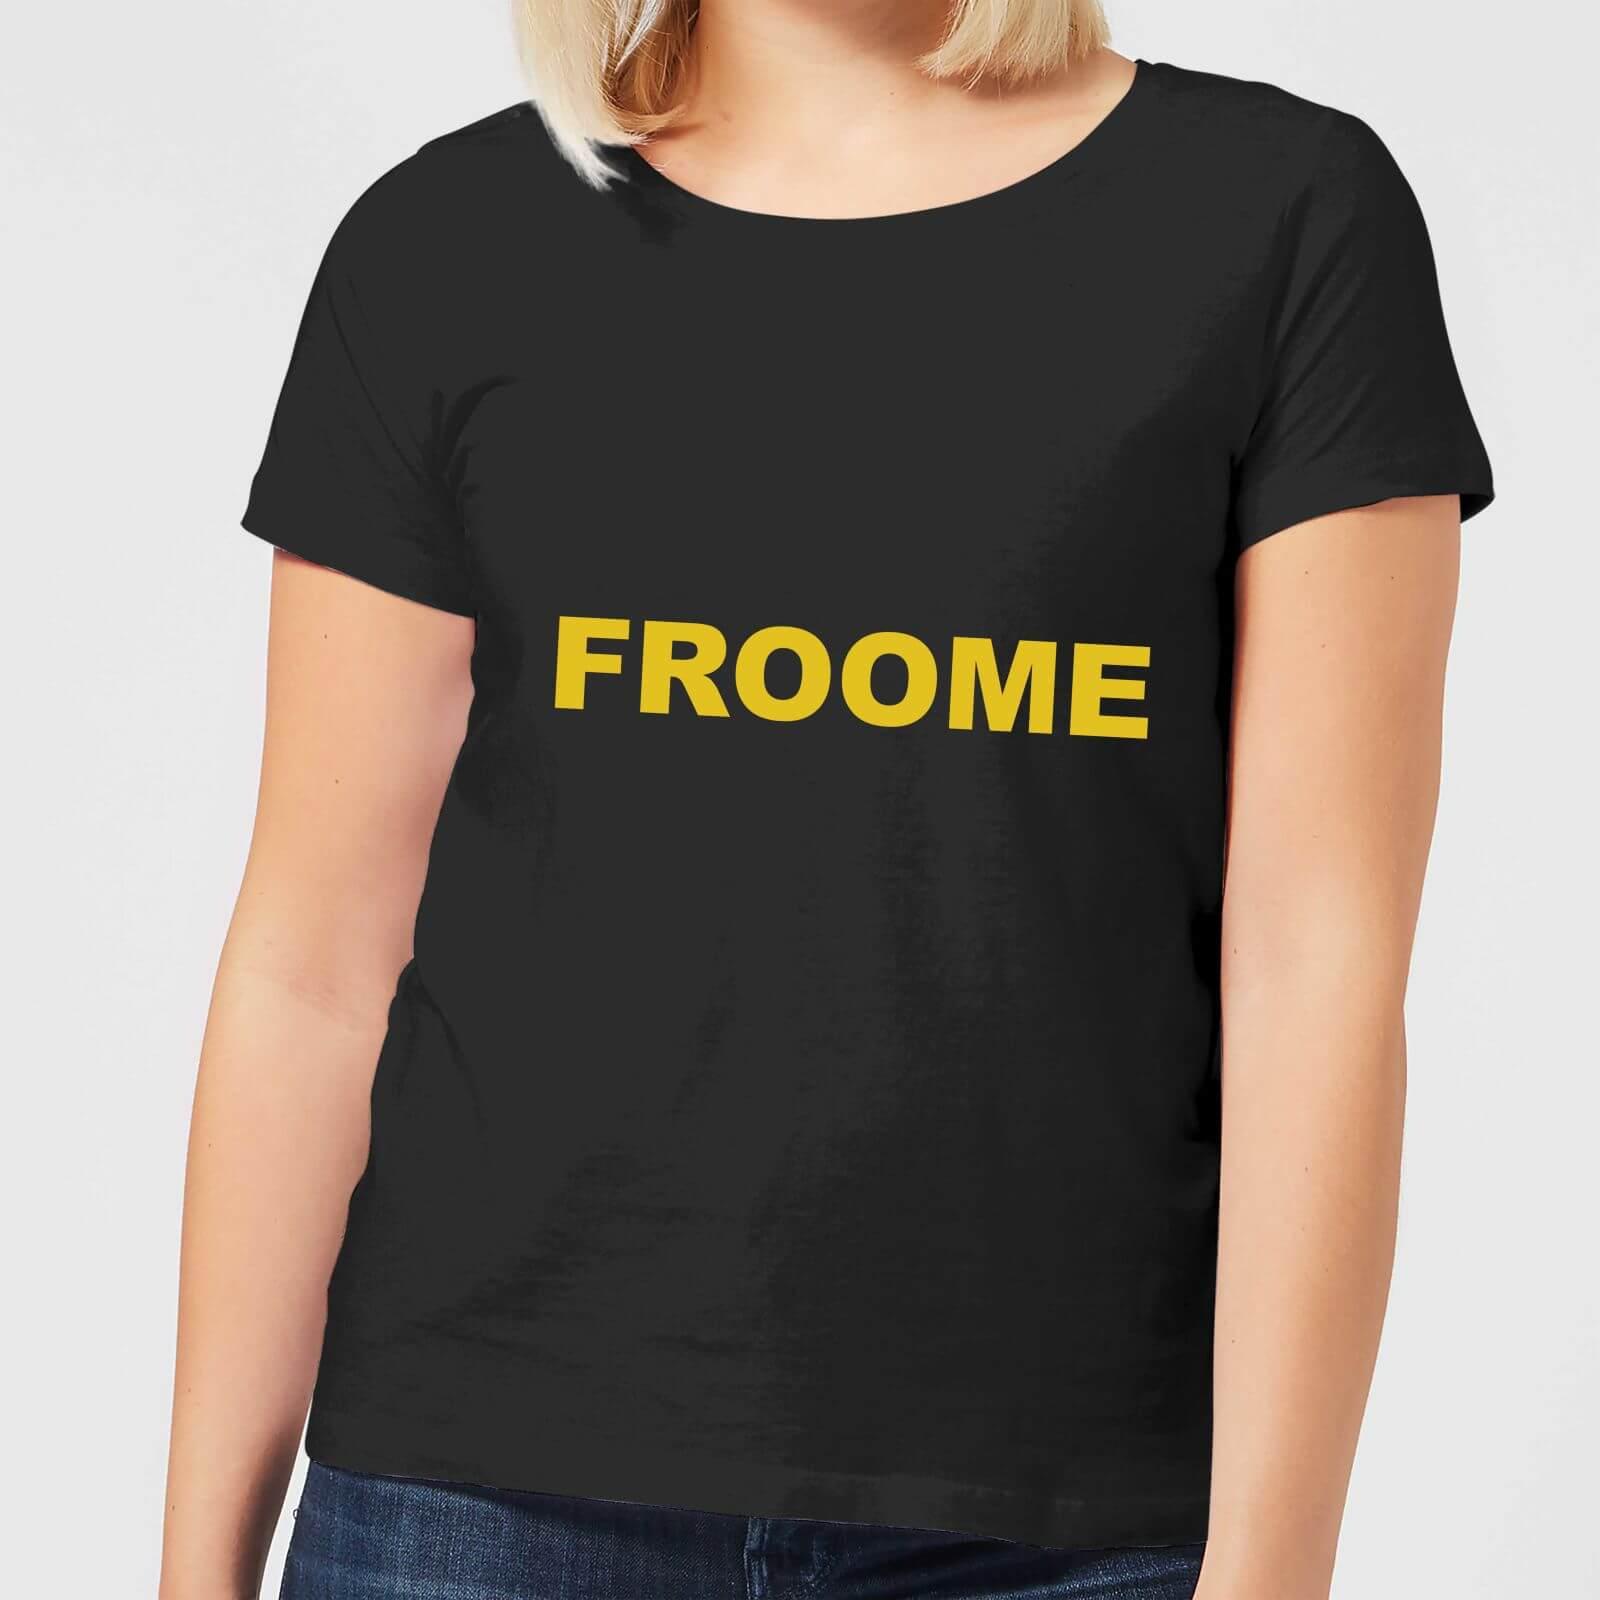 Summit Finish Froome - Rider Name Women's T-Shirt - Black - XXL - Black